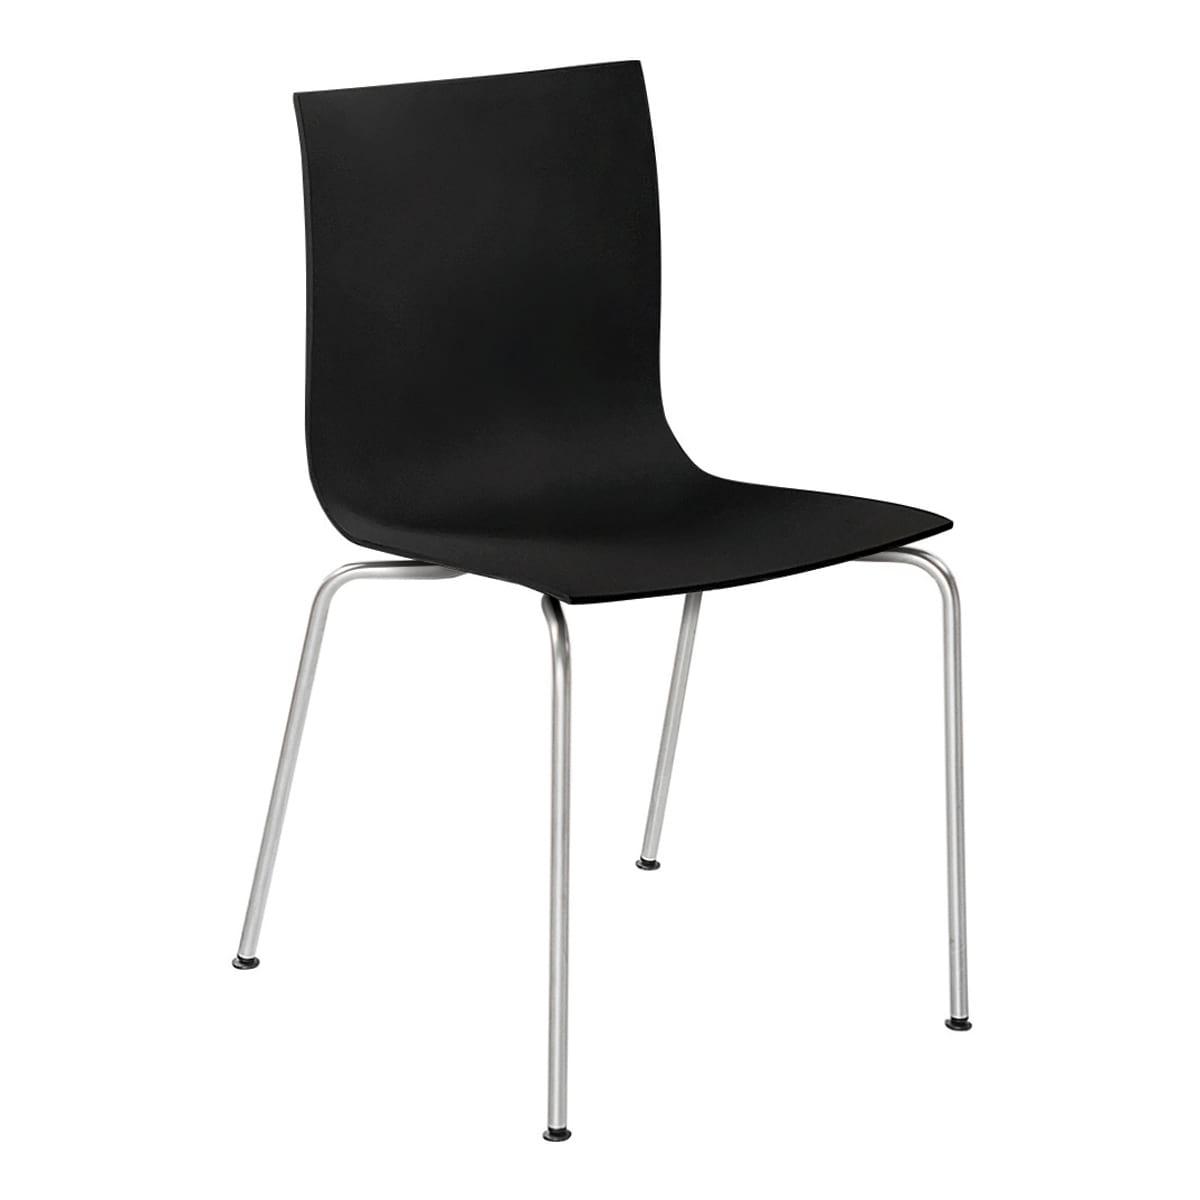 Stuhl Thin S16, schwarz